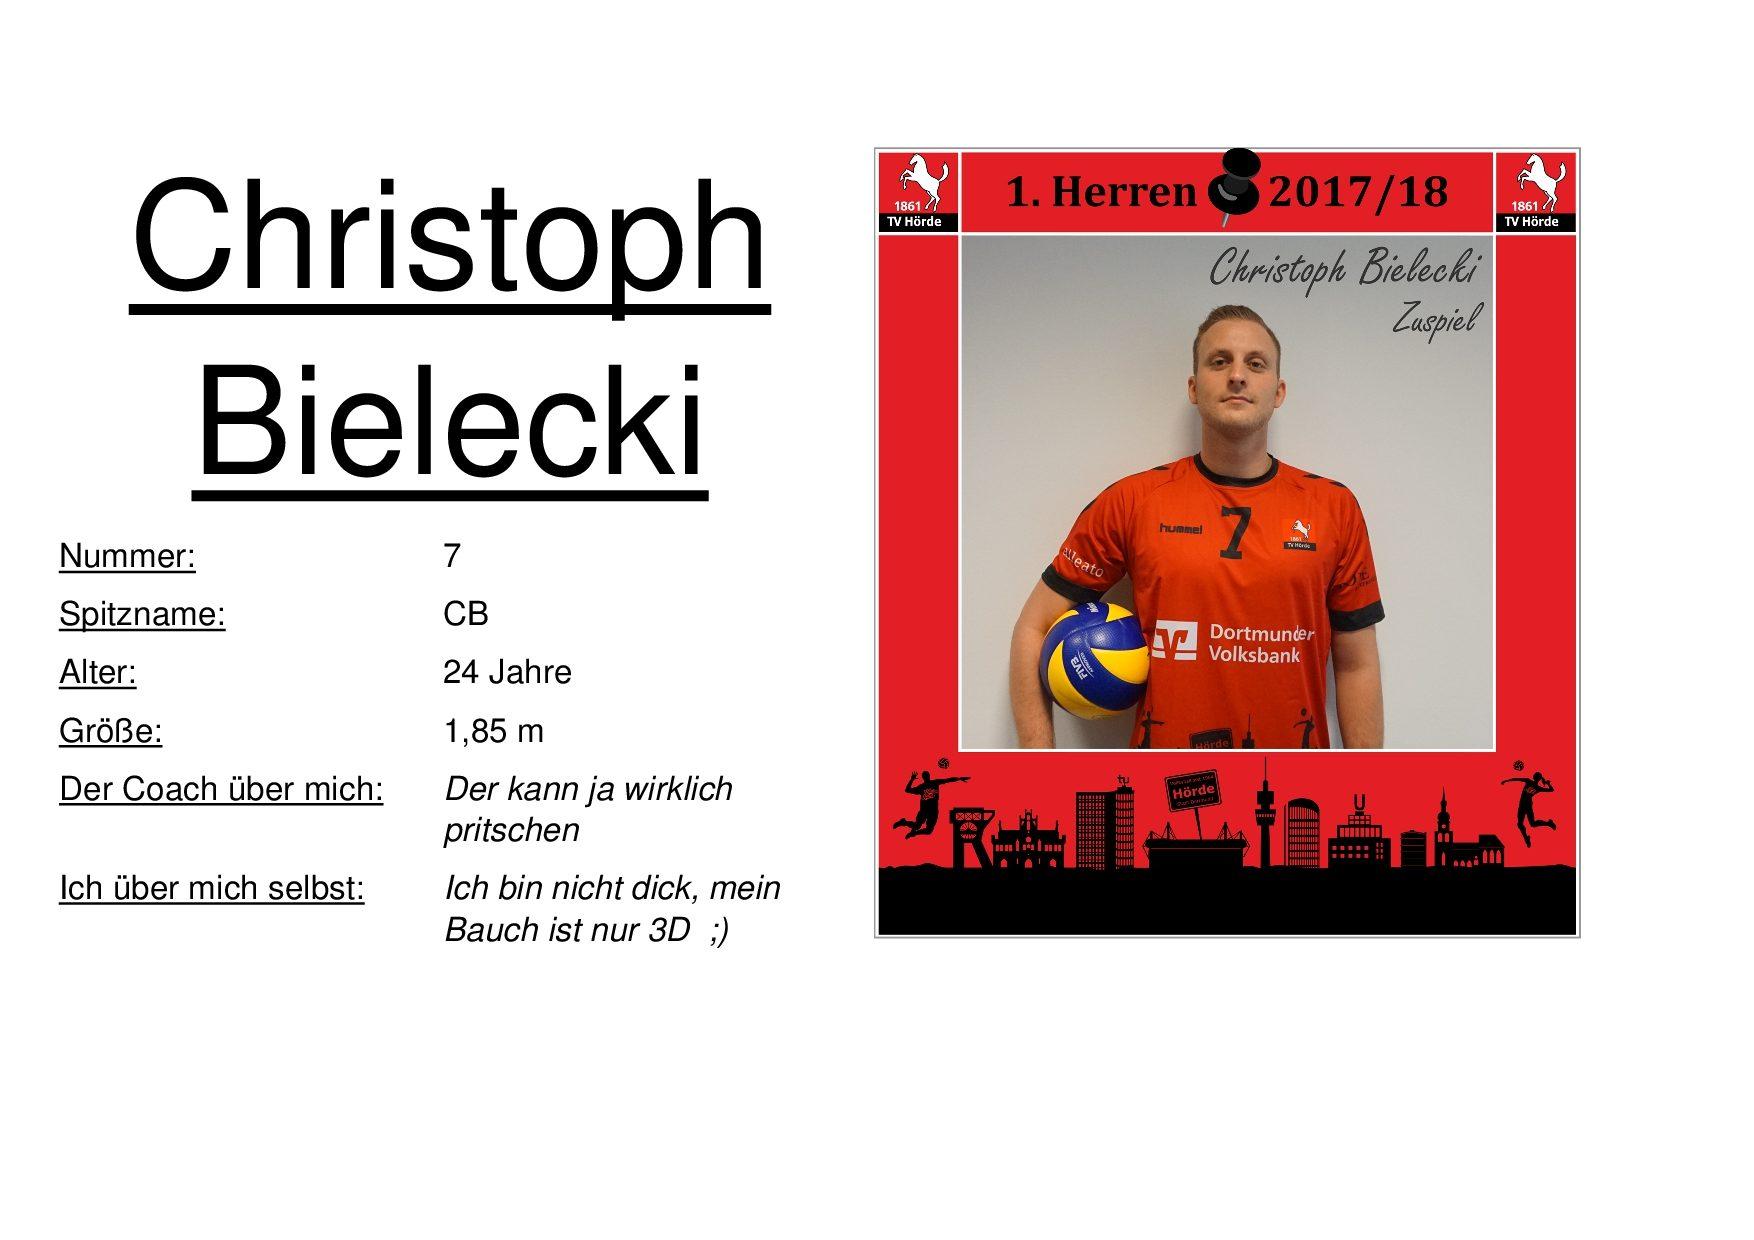 Christoph Bielecki